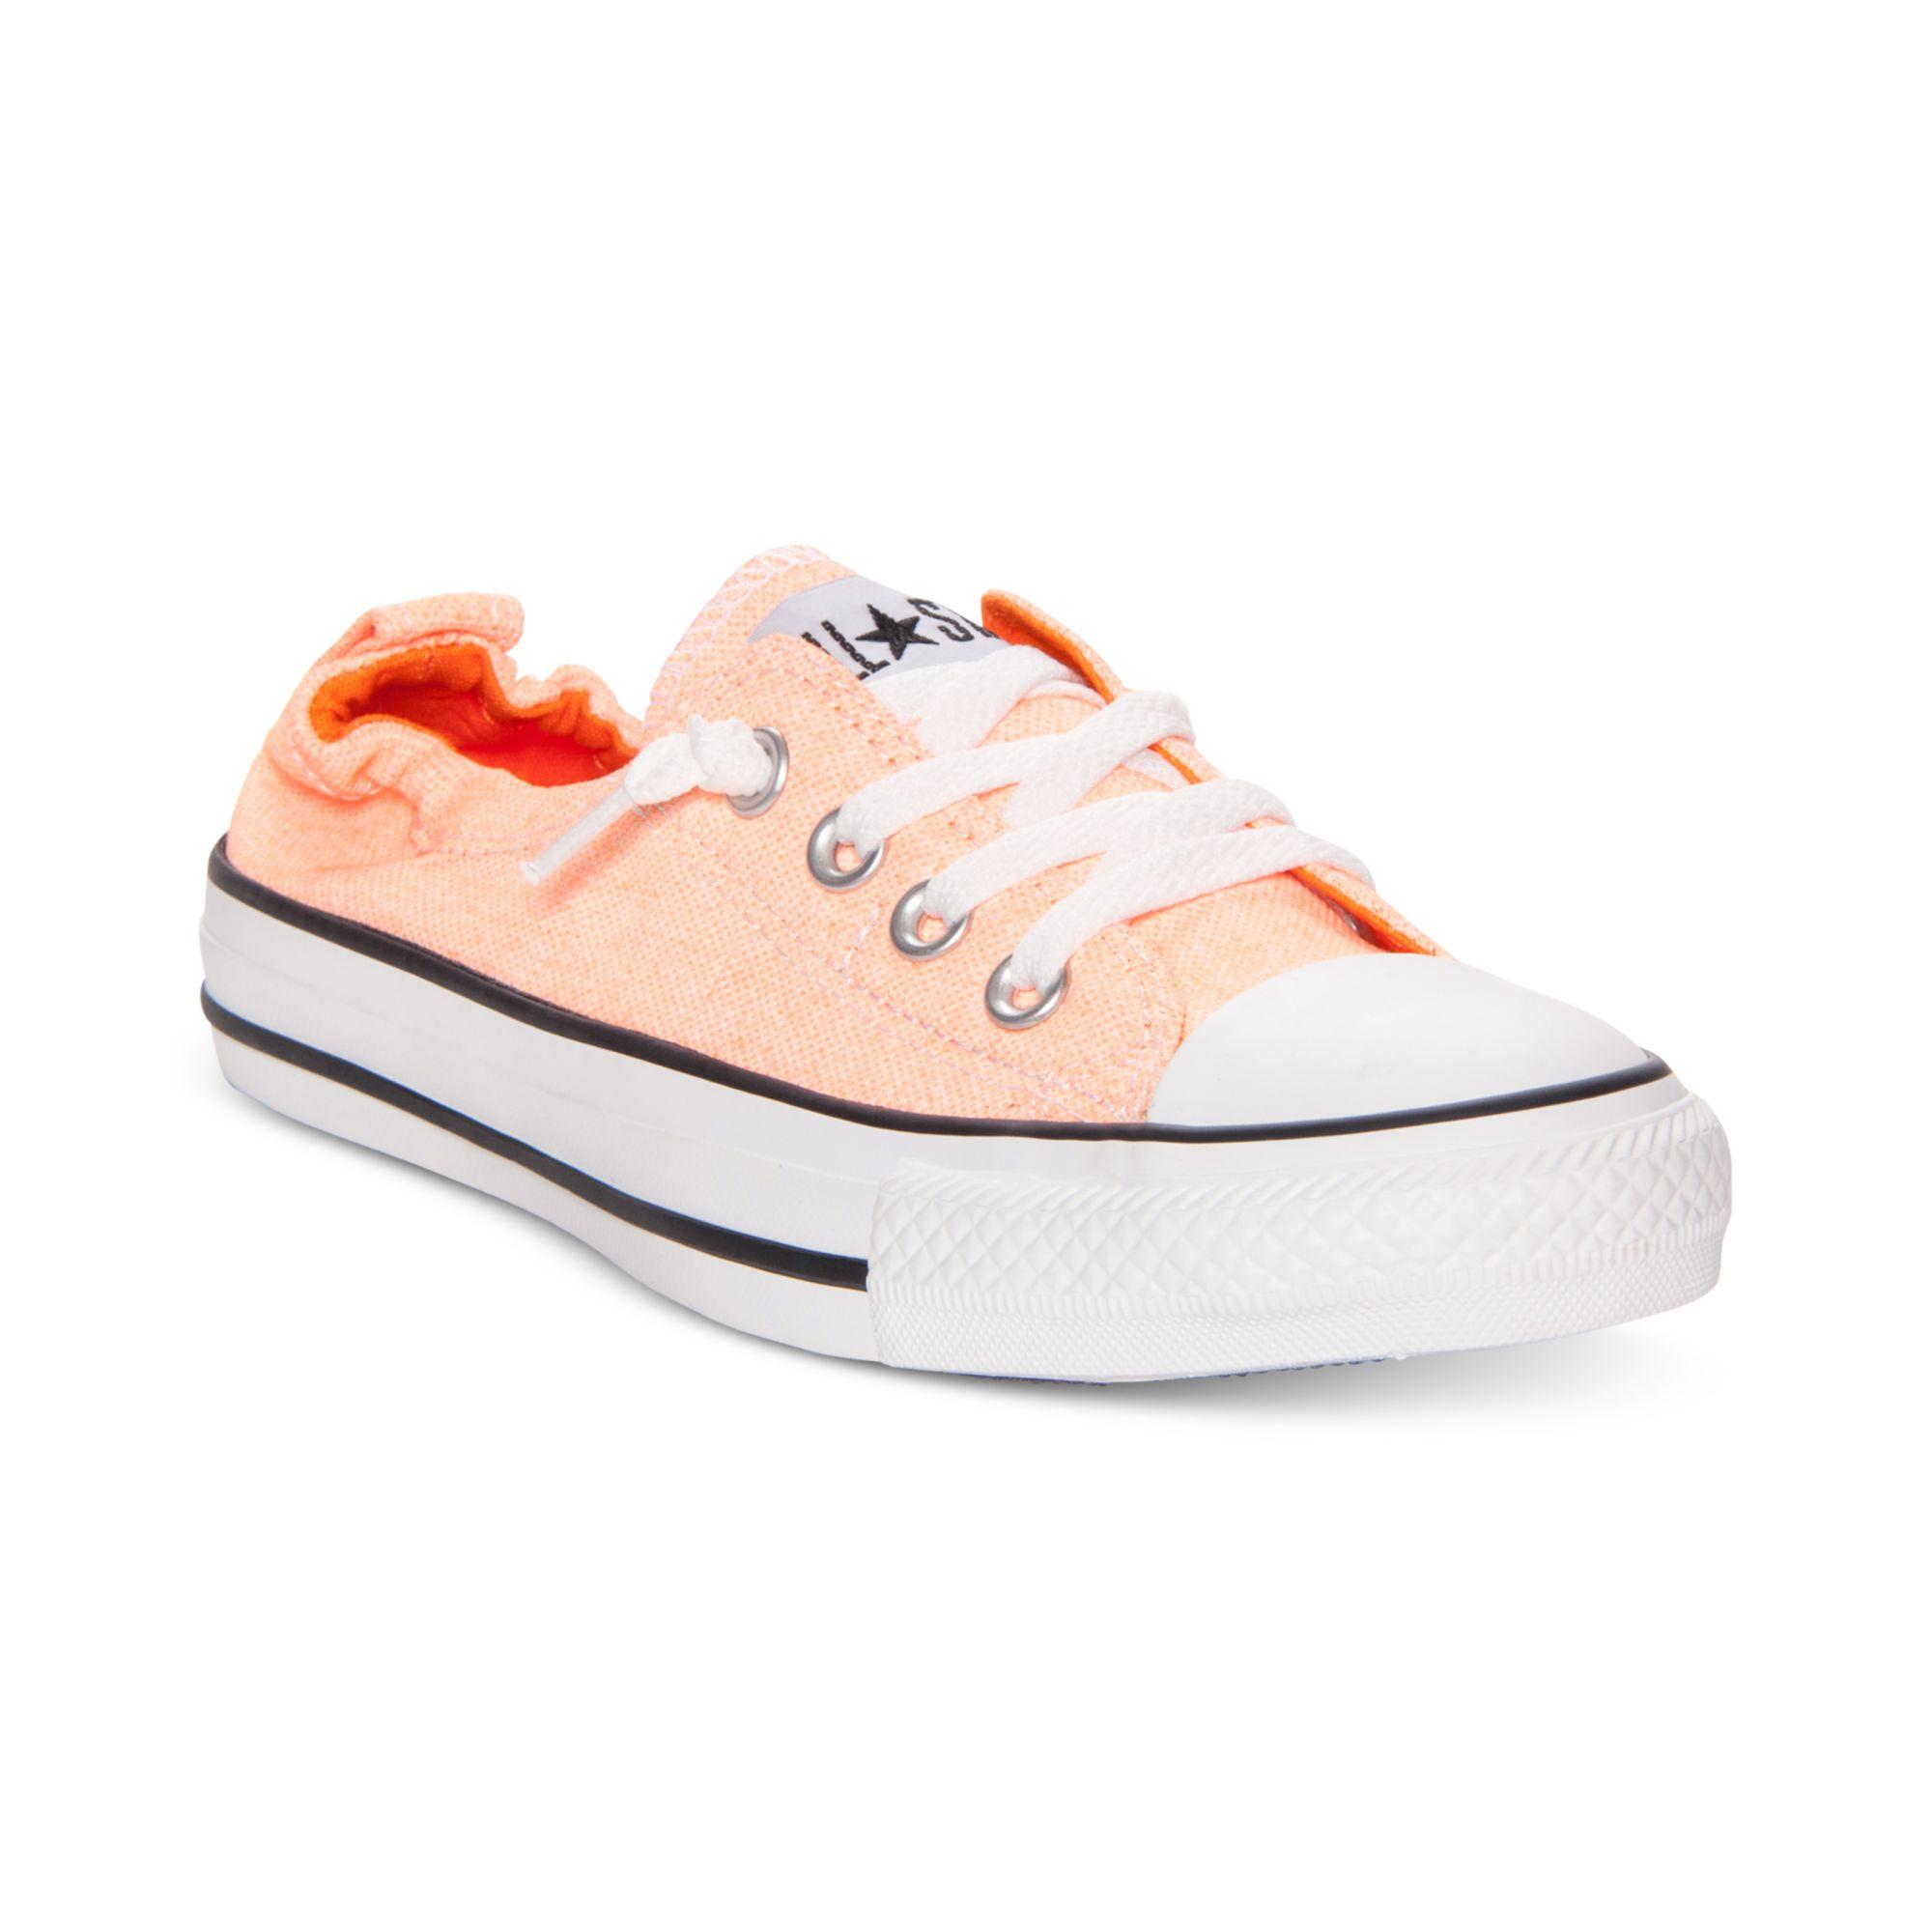 be30e1d0a01c Lyst - Converse Chuck Taylor Shoreline Casual Sneakers in Orange